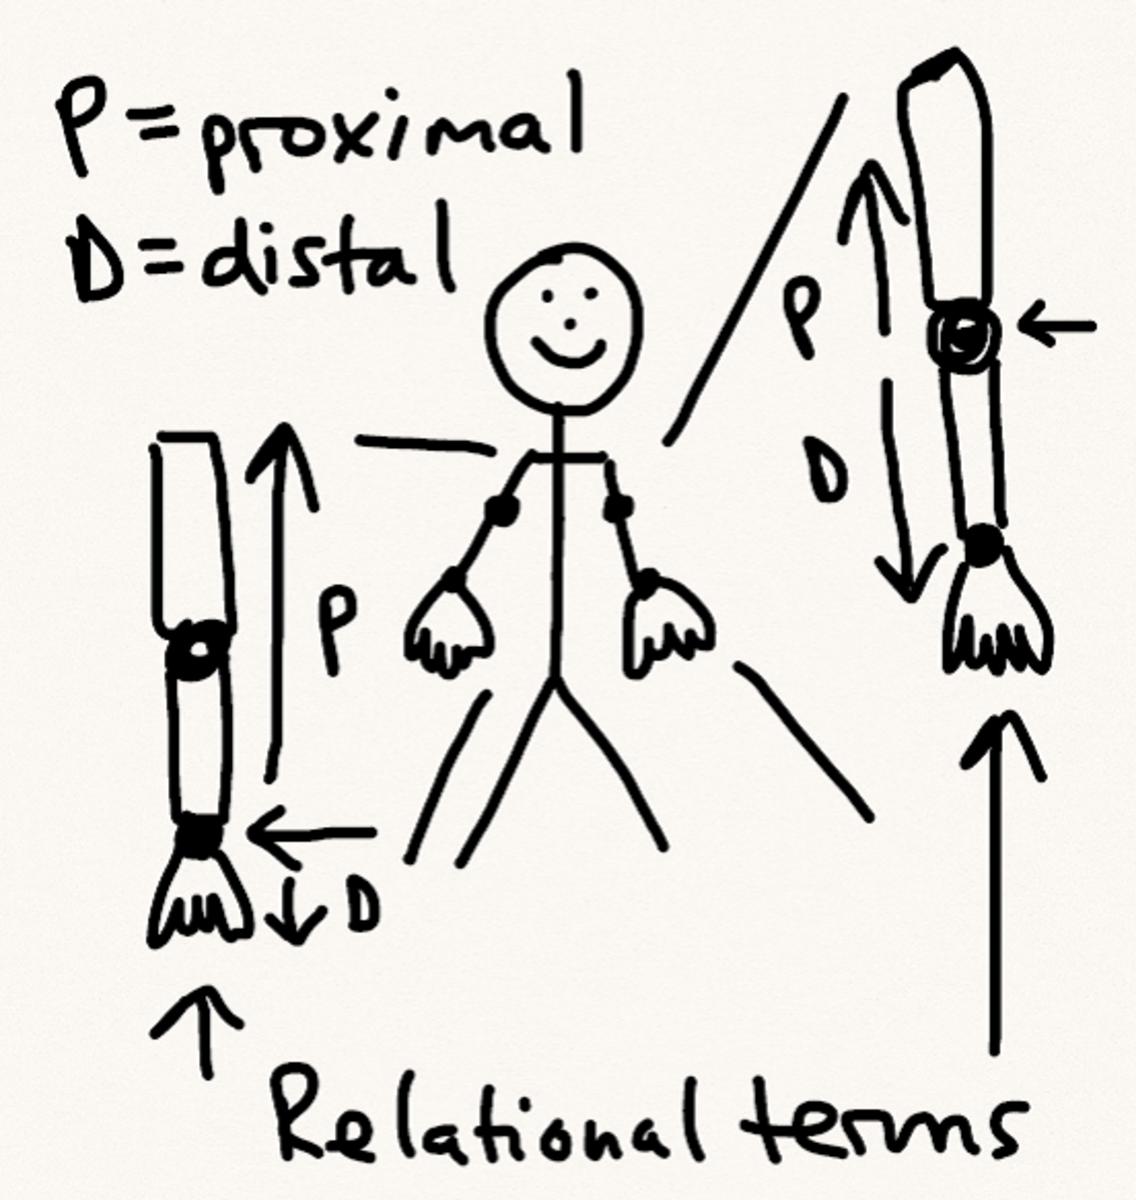 Proximal/distal schematic